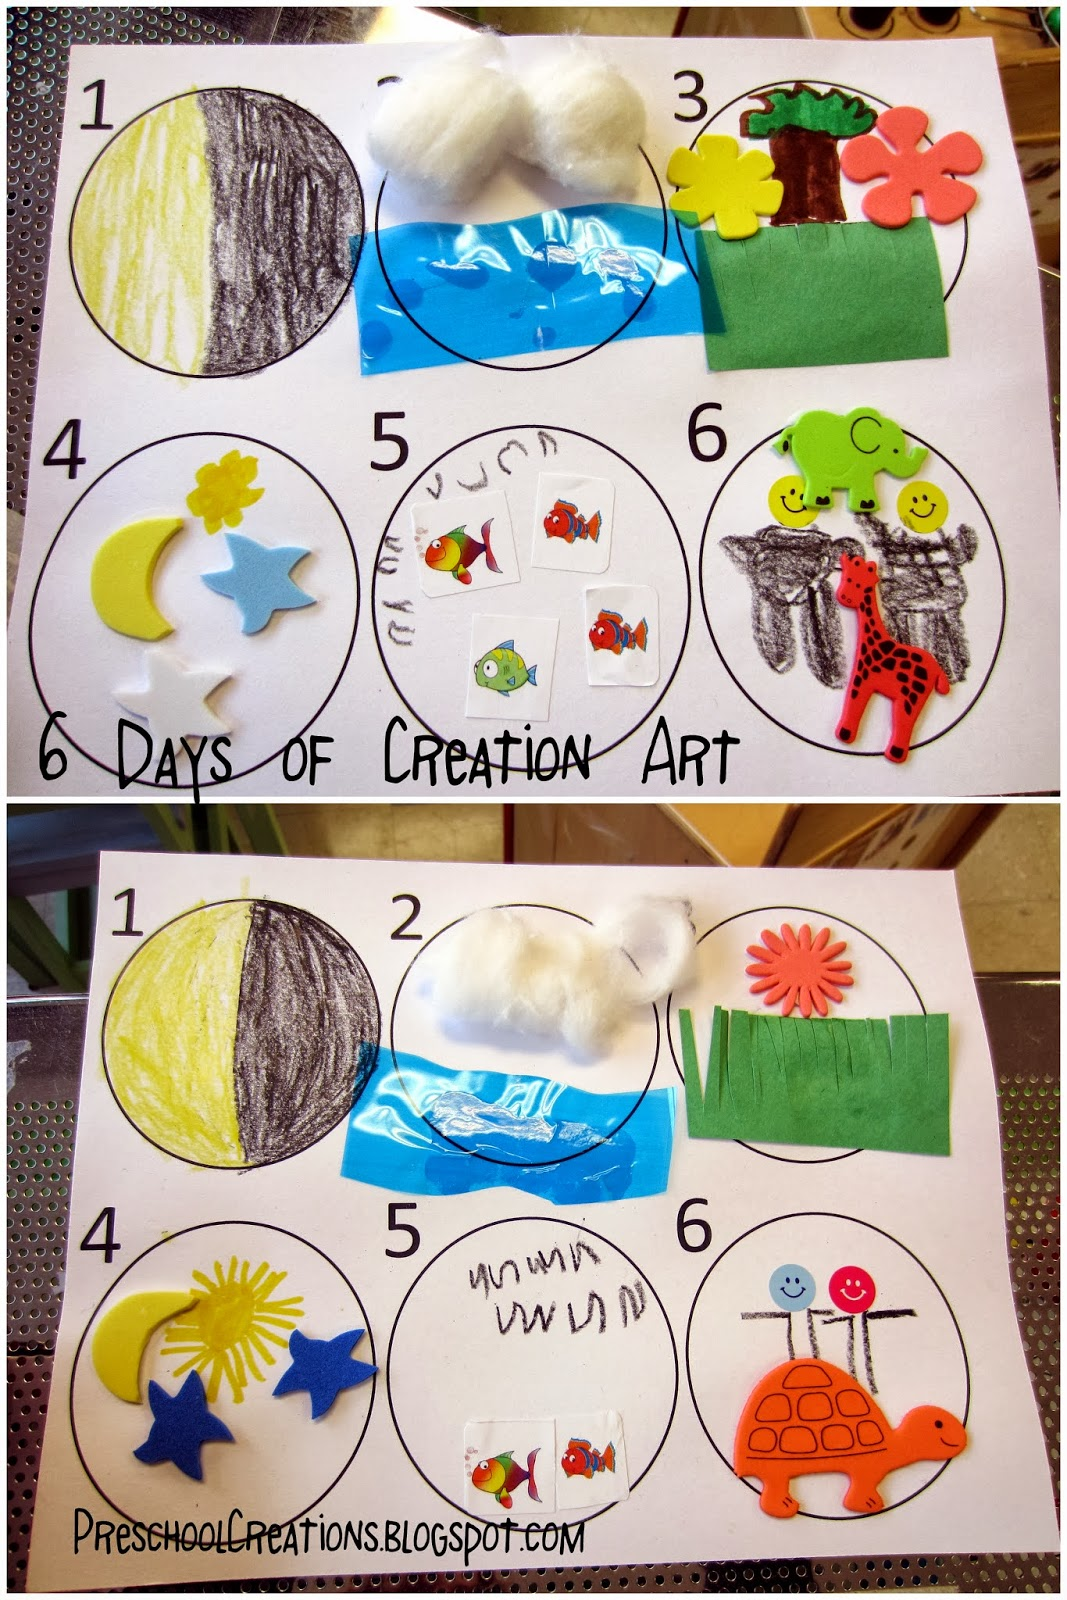 Preschool Creations